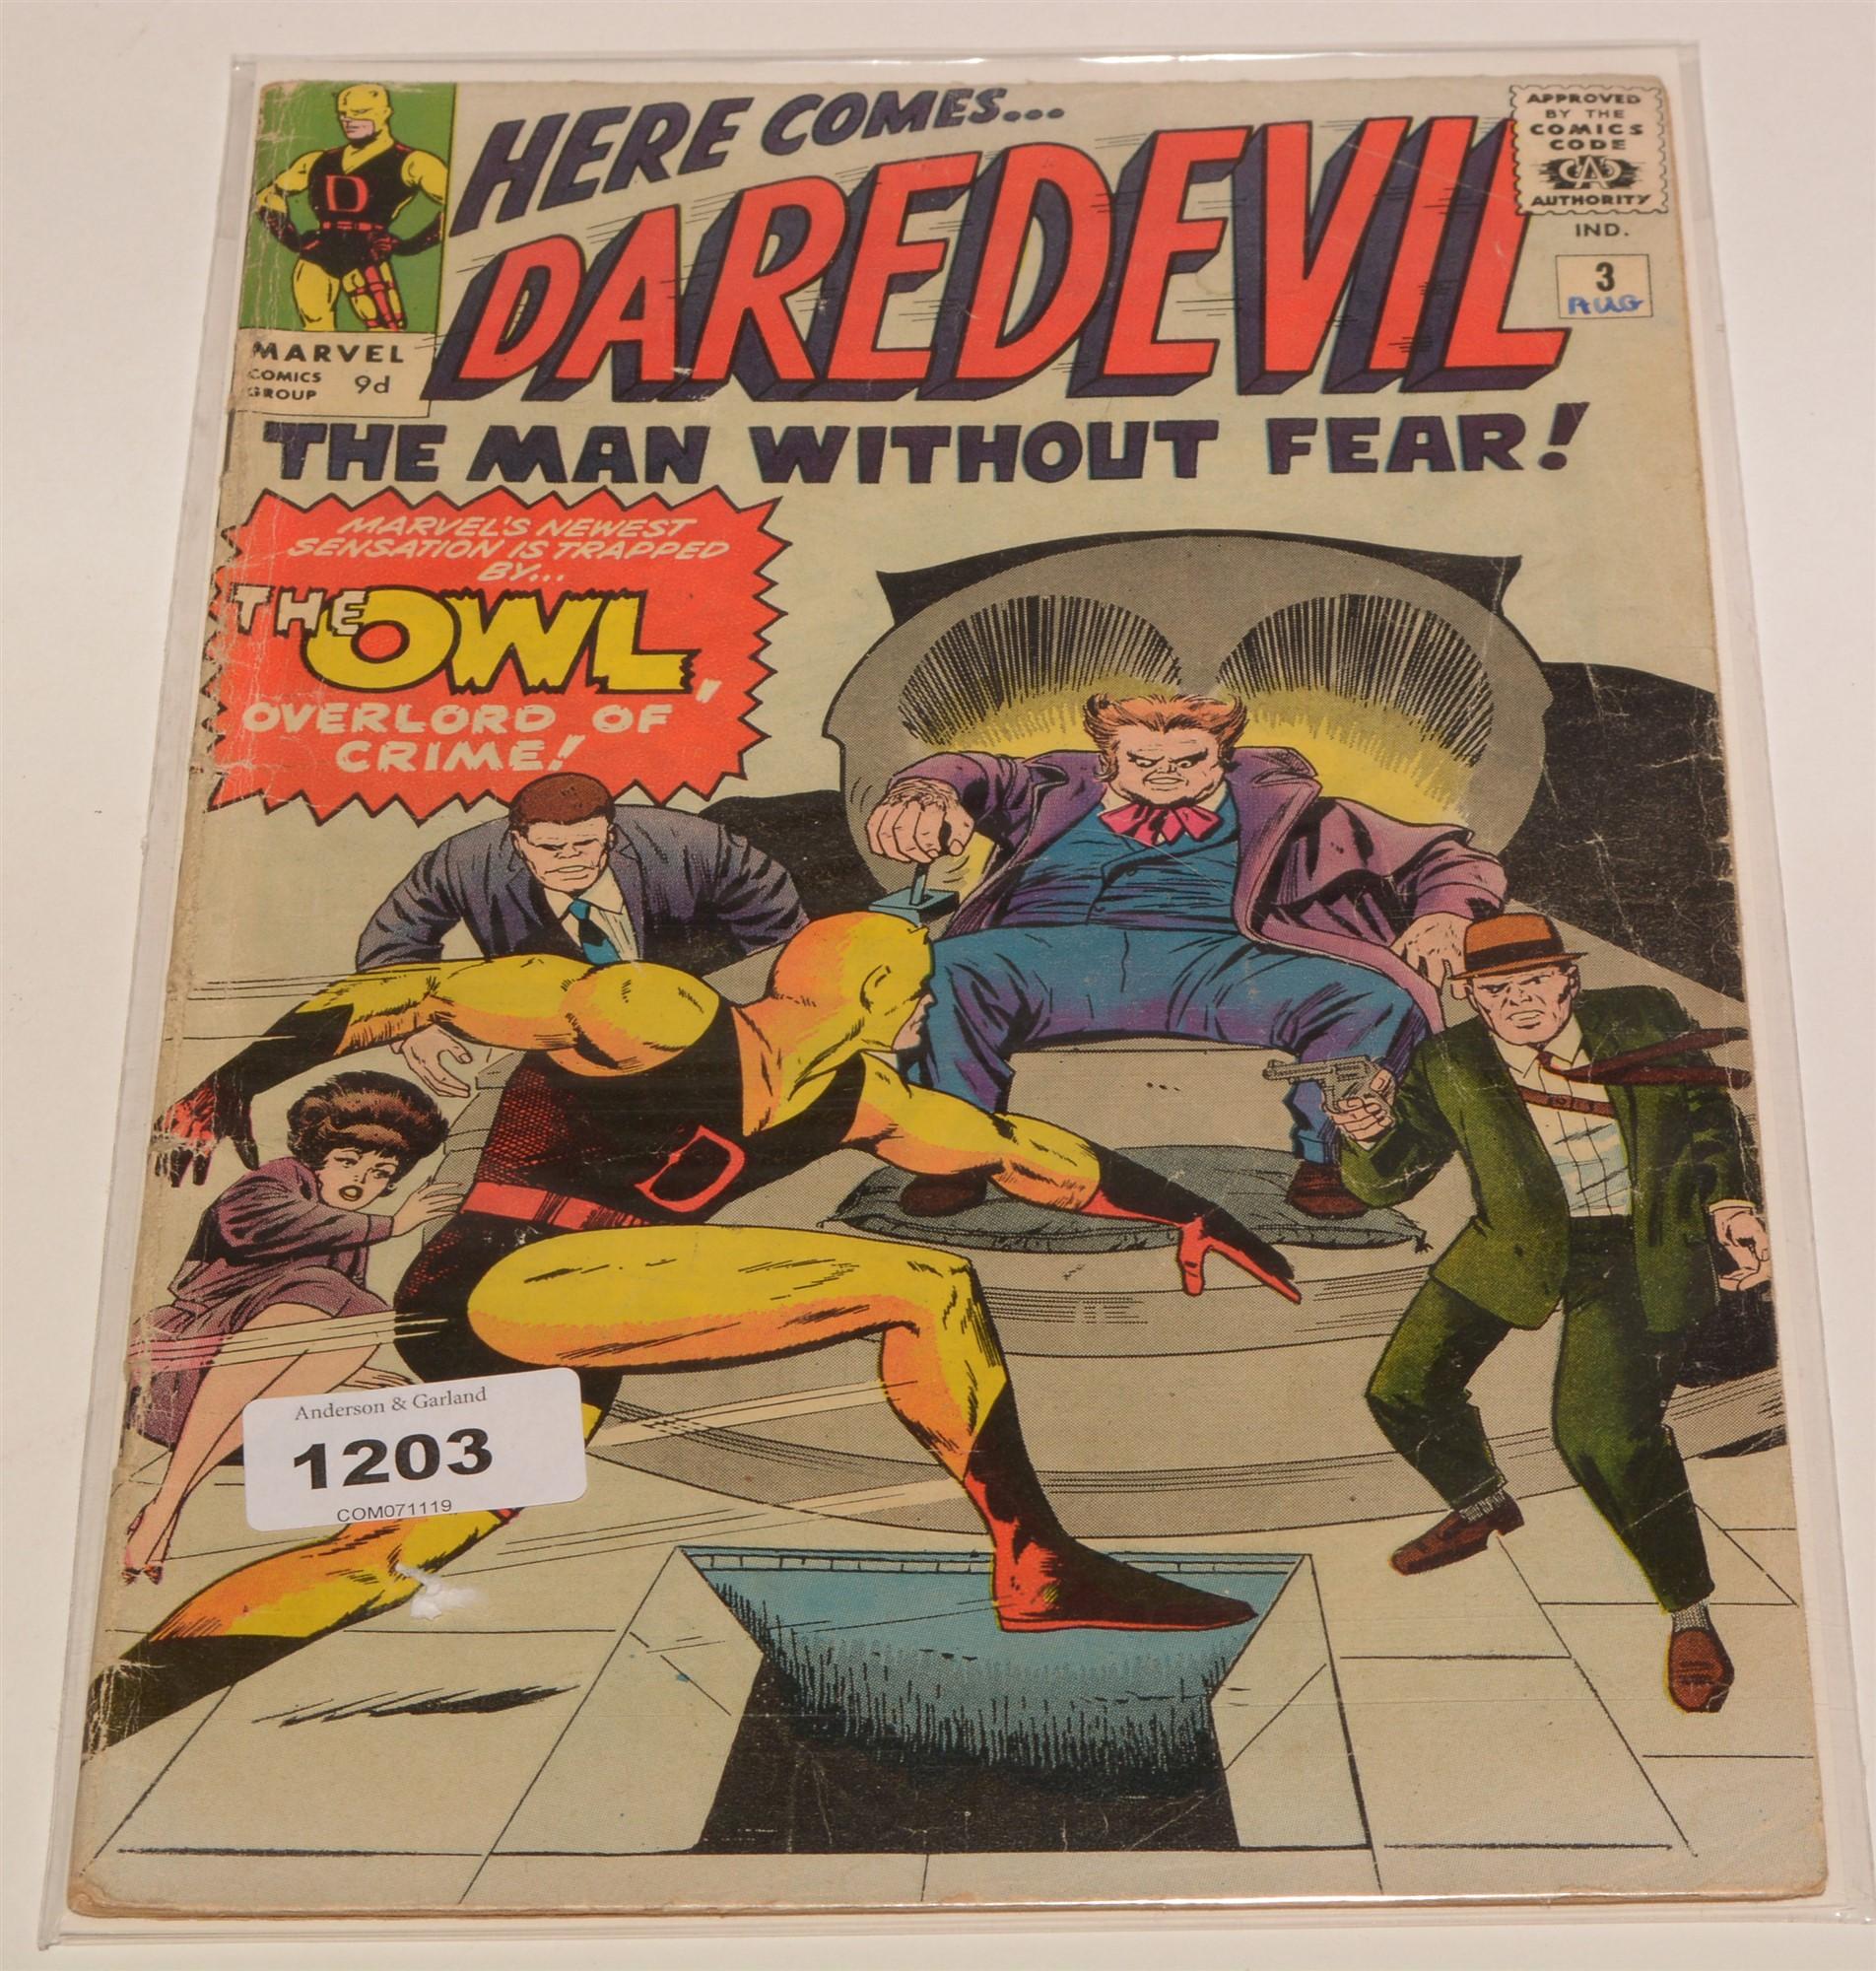 The Silver Surfer No. 5 and Daredevil No. 3. - Image 2 of 2